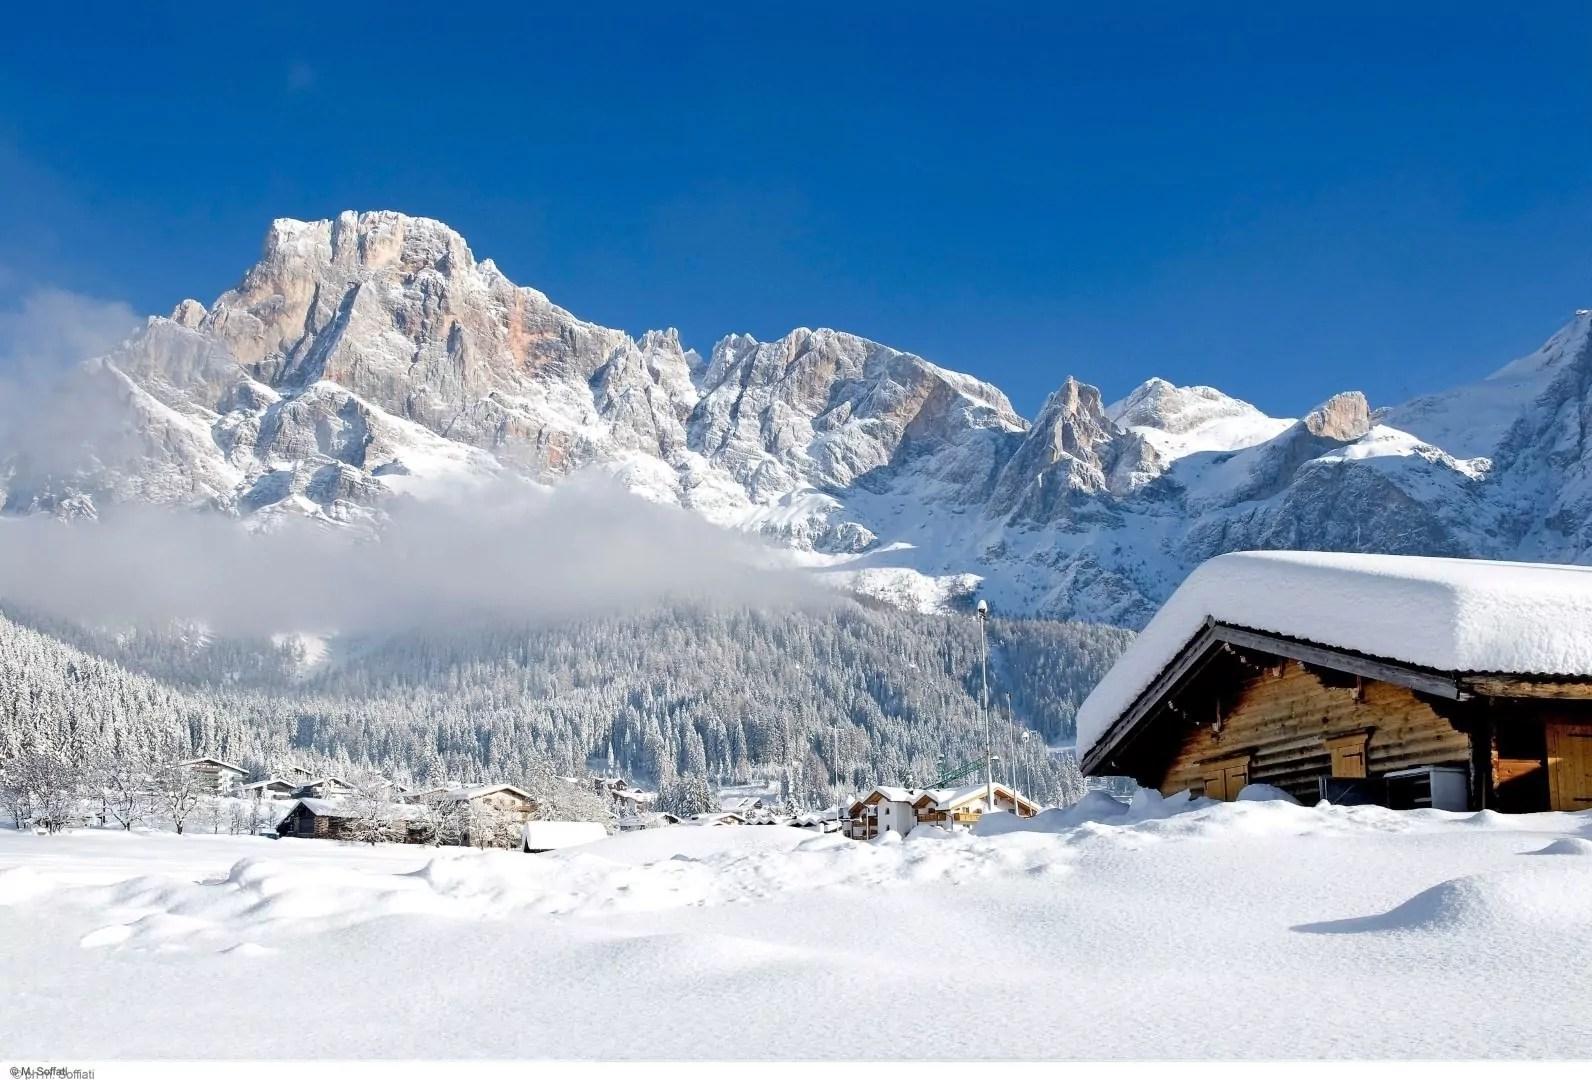 wintersport en aanbiedingen in San Martino di Castrozza